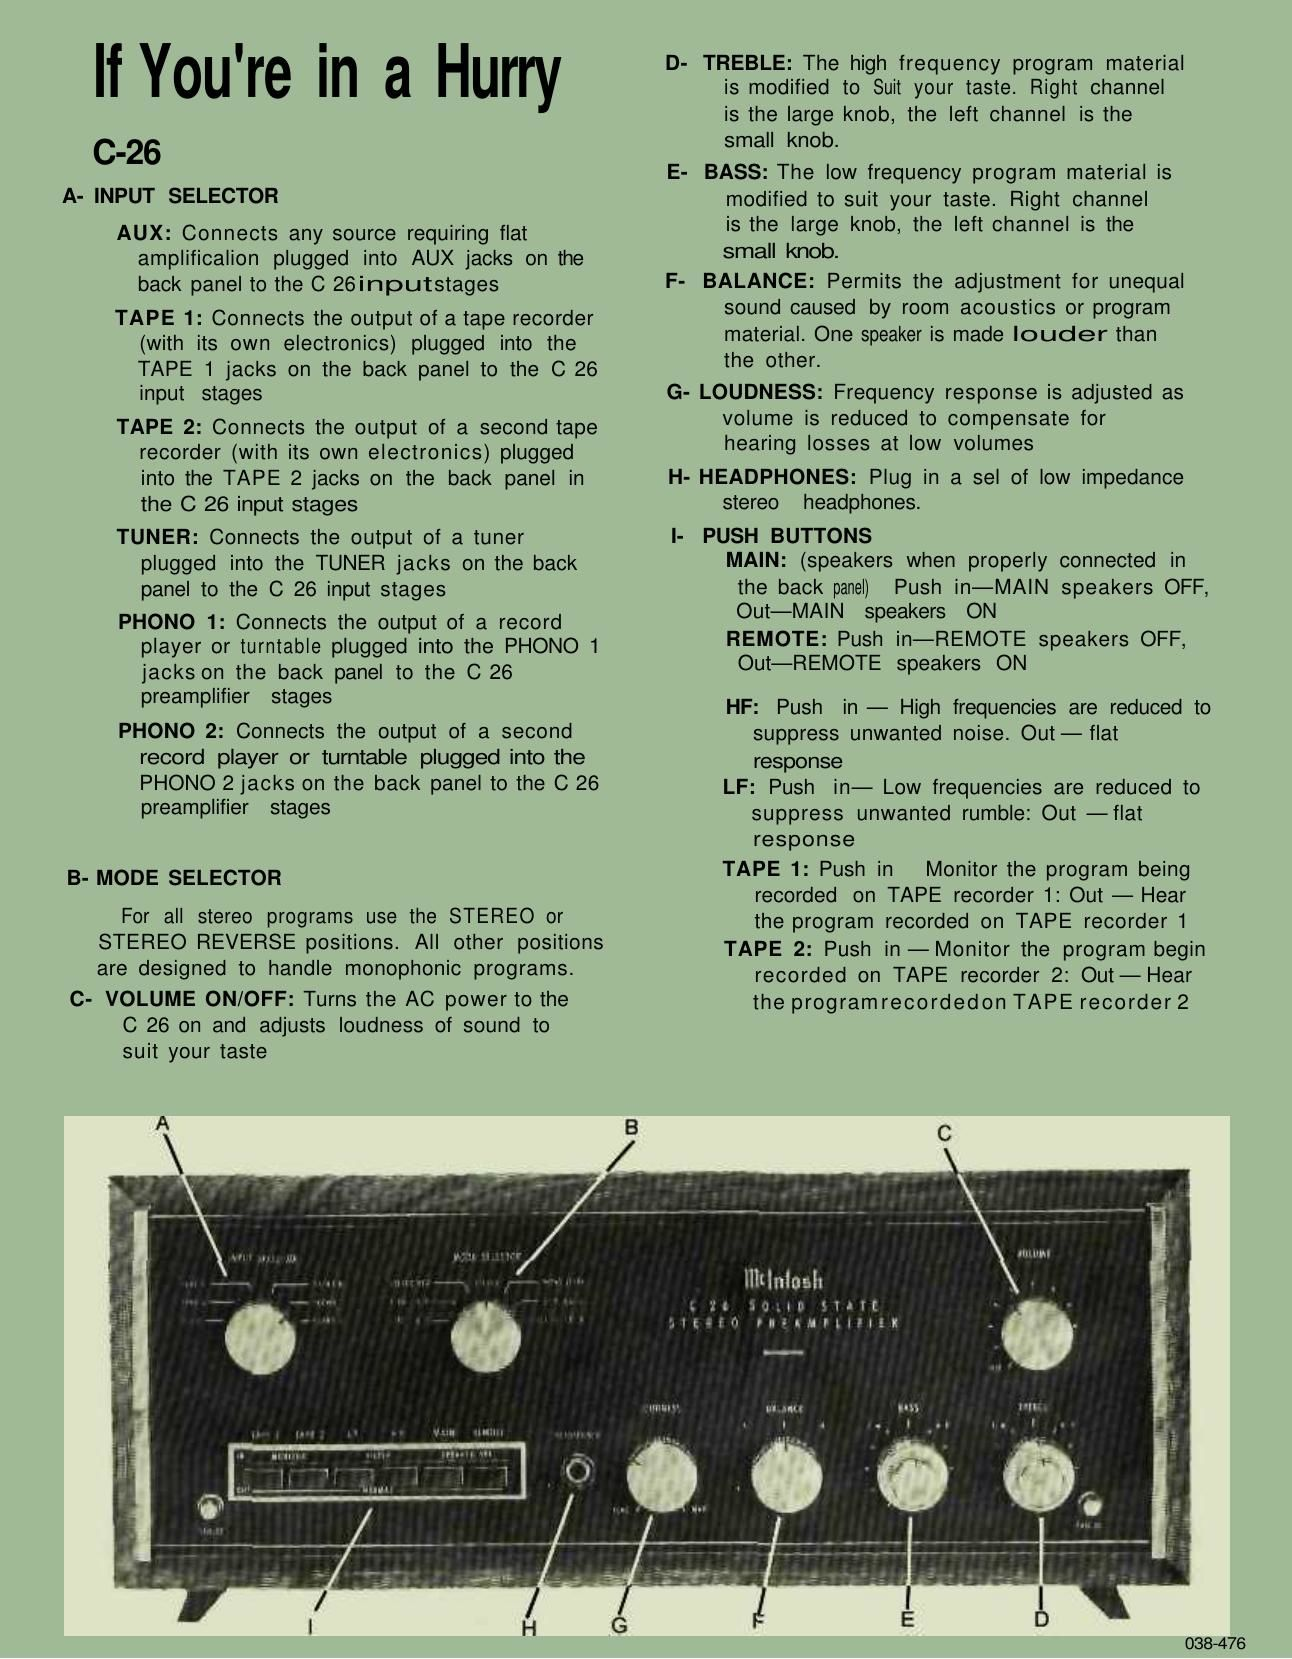 mcintosh c26 instruction manual rh audioservicemanuals com